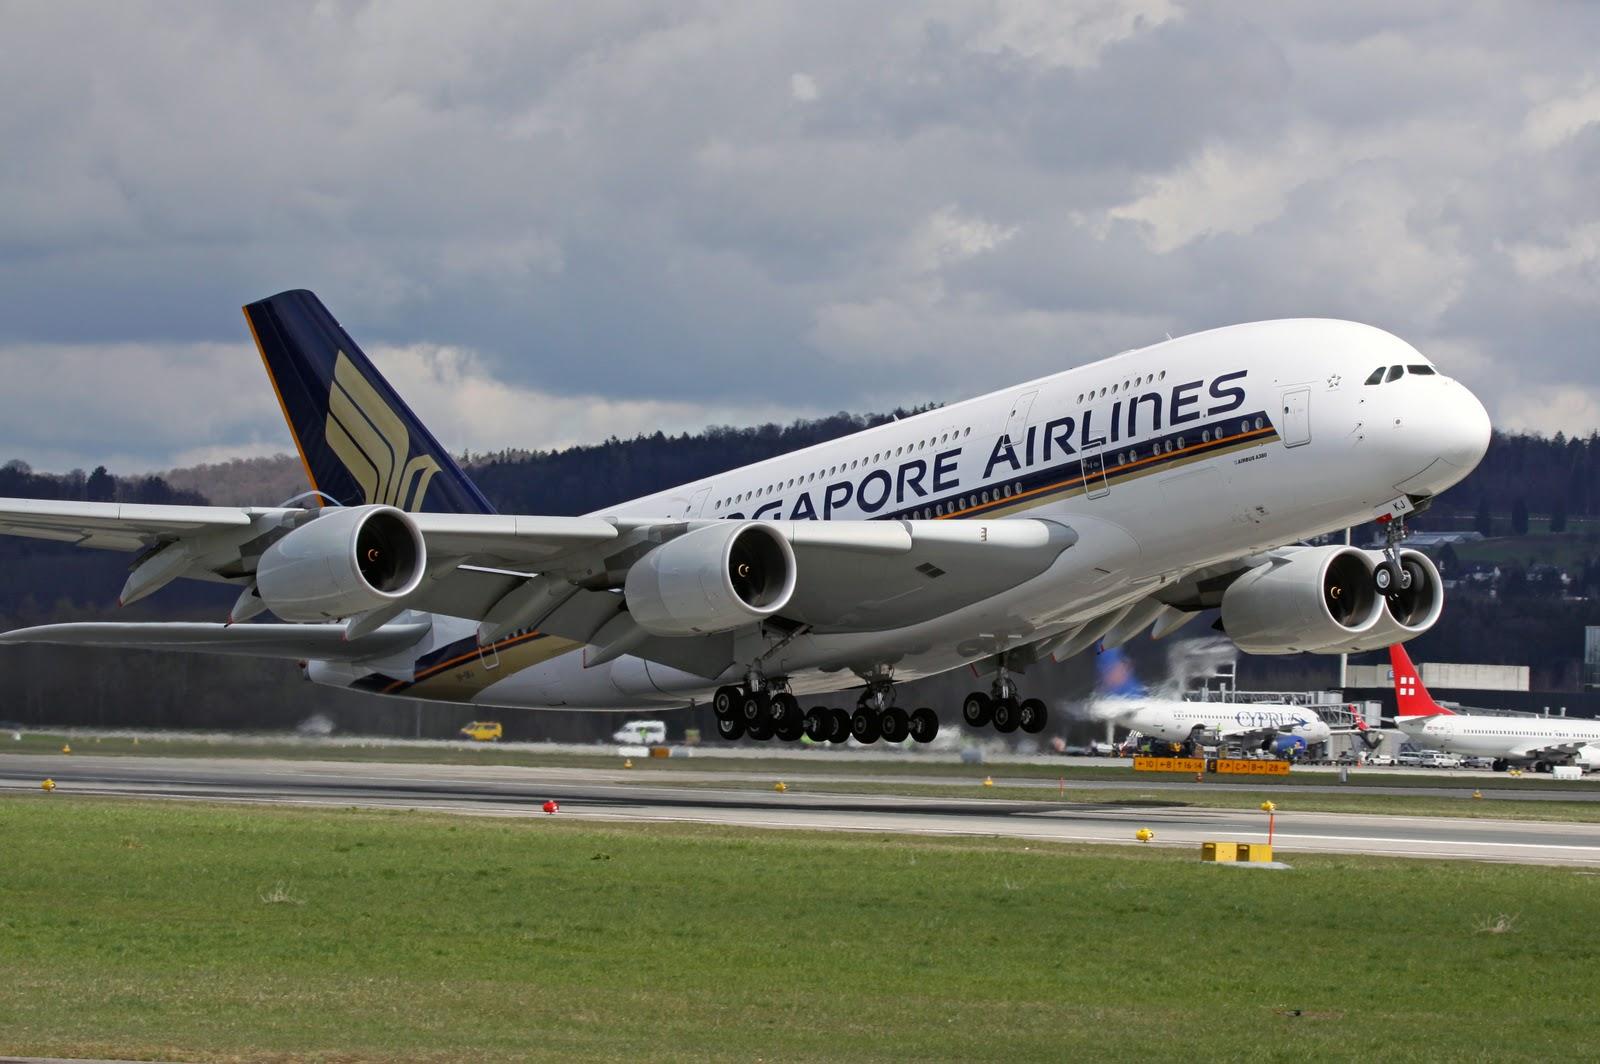 http://4.bp.blogspot.com/-BvZEk8L582g/TvHTAiR5FQI/AAAAAAAAHIA/5JDLzJUii3g/s1600/airbus_a380_takeoff.jpg